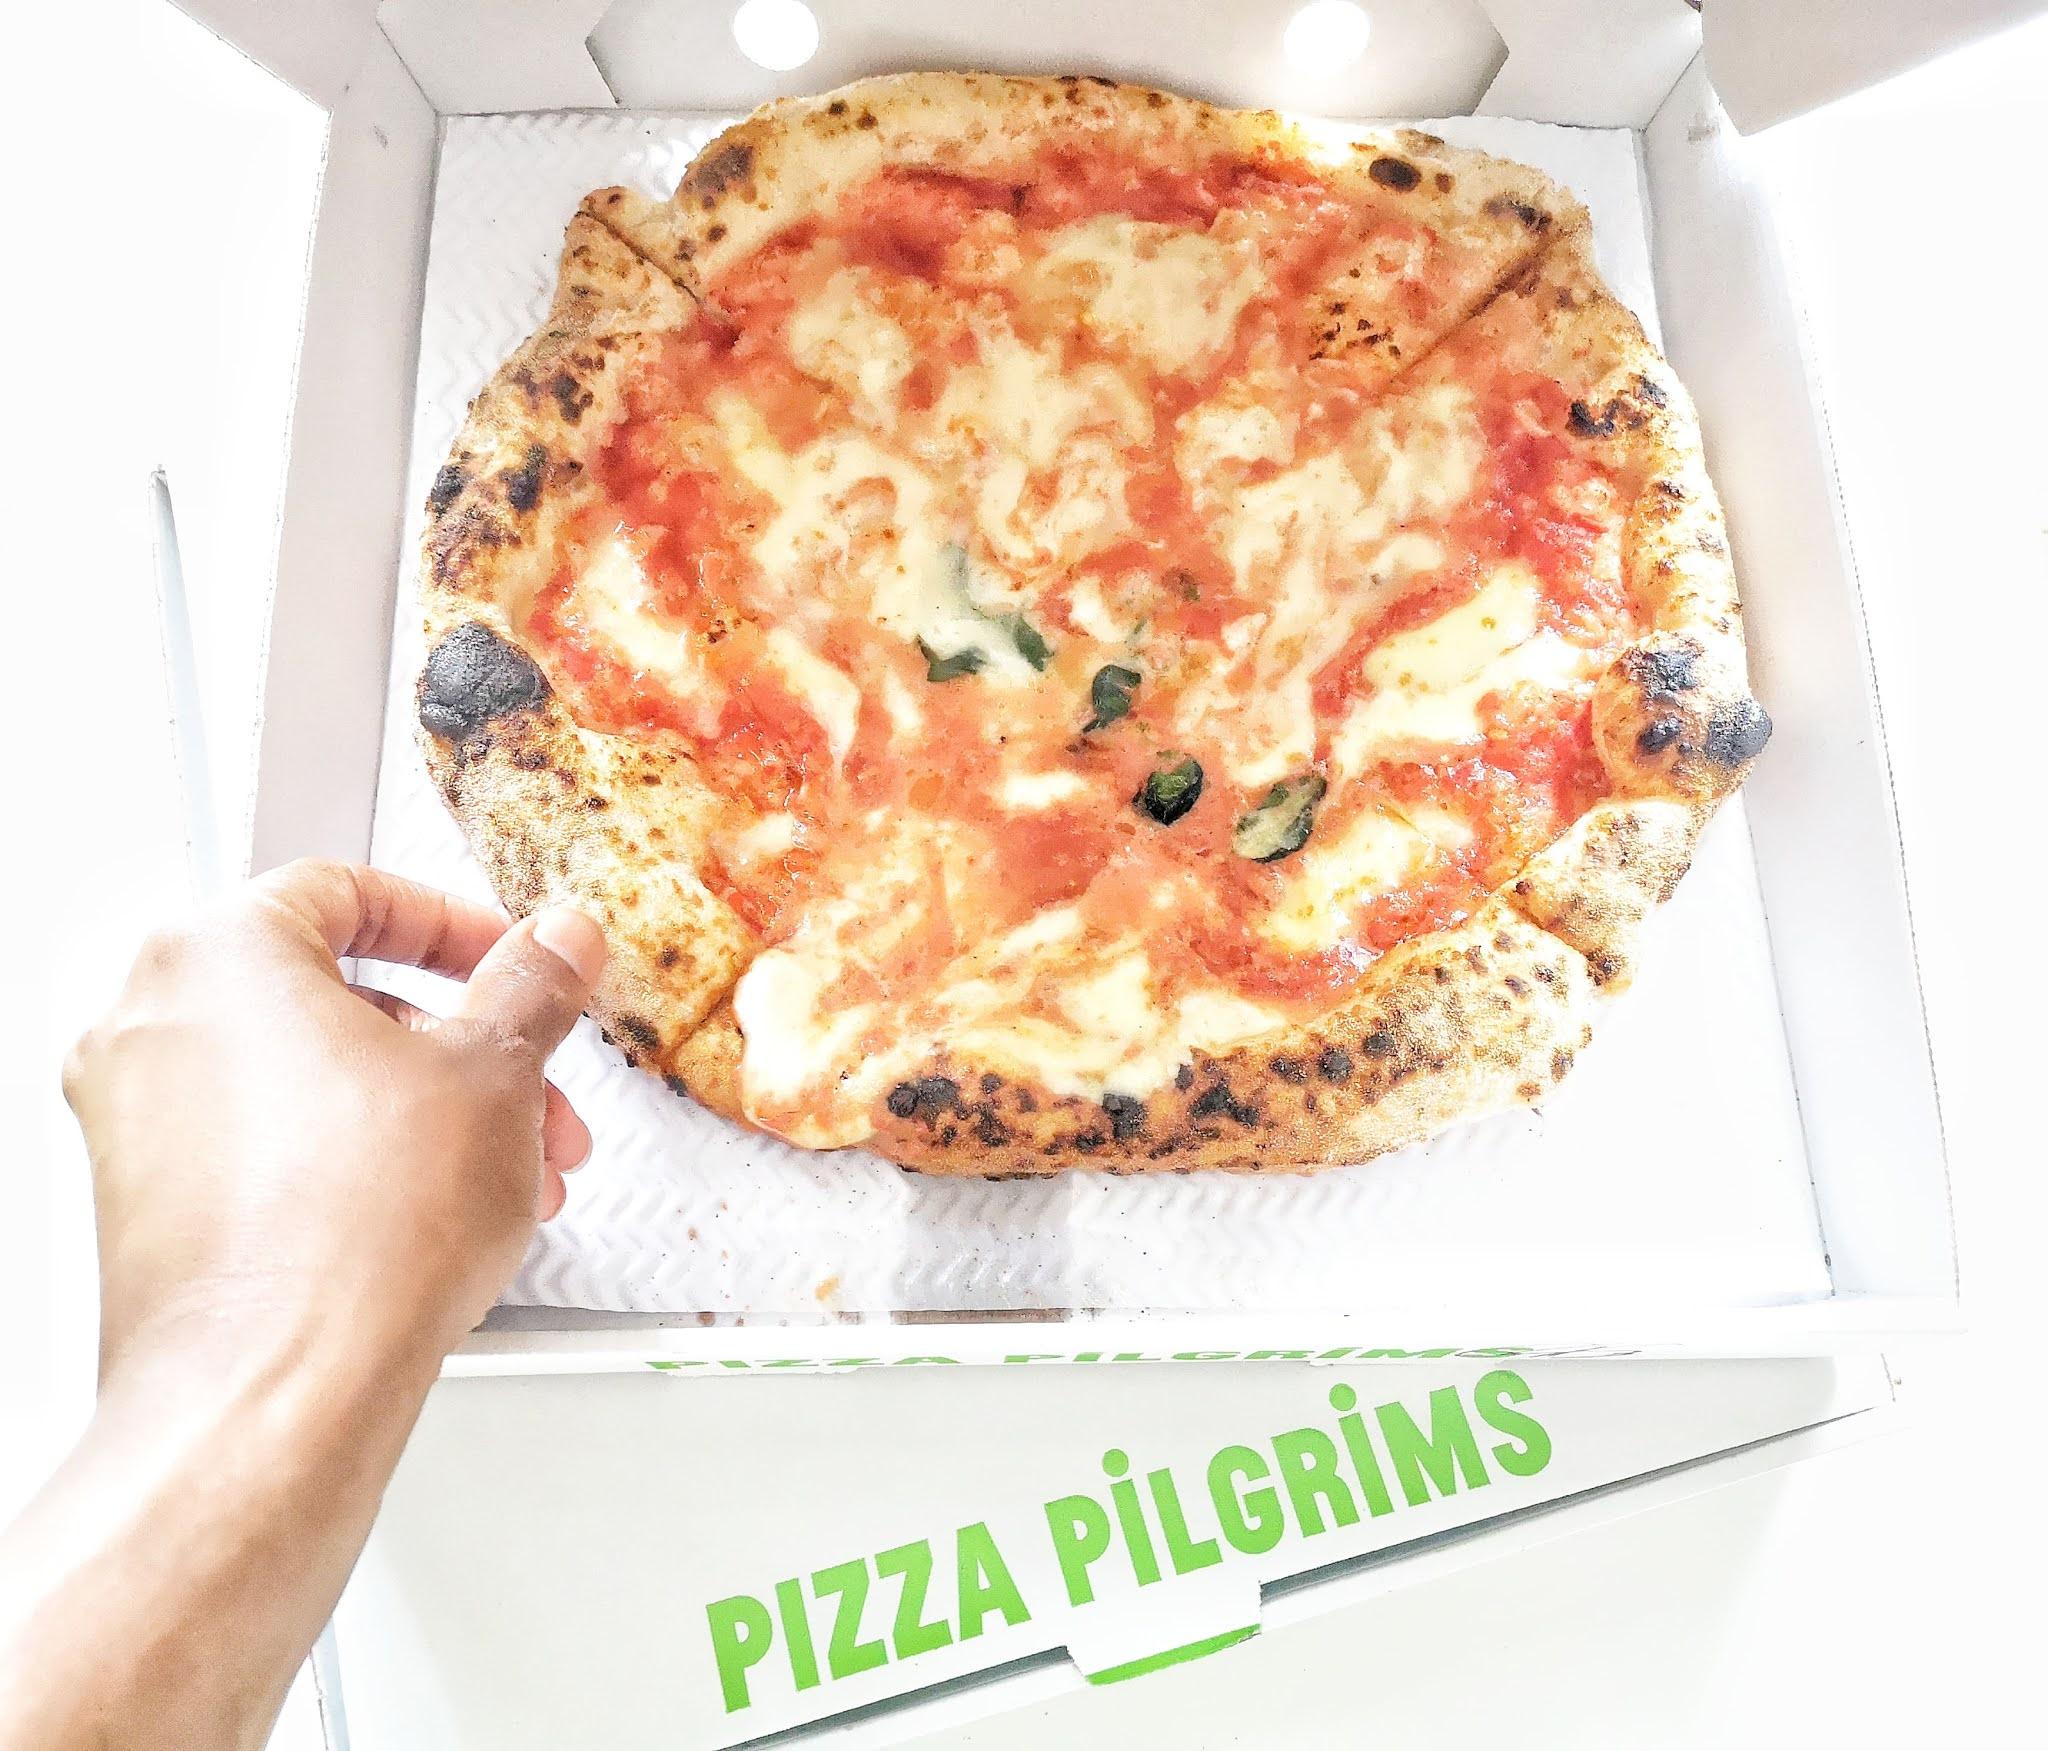 Pizza in London